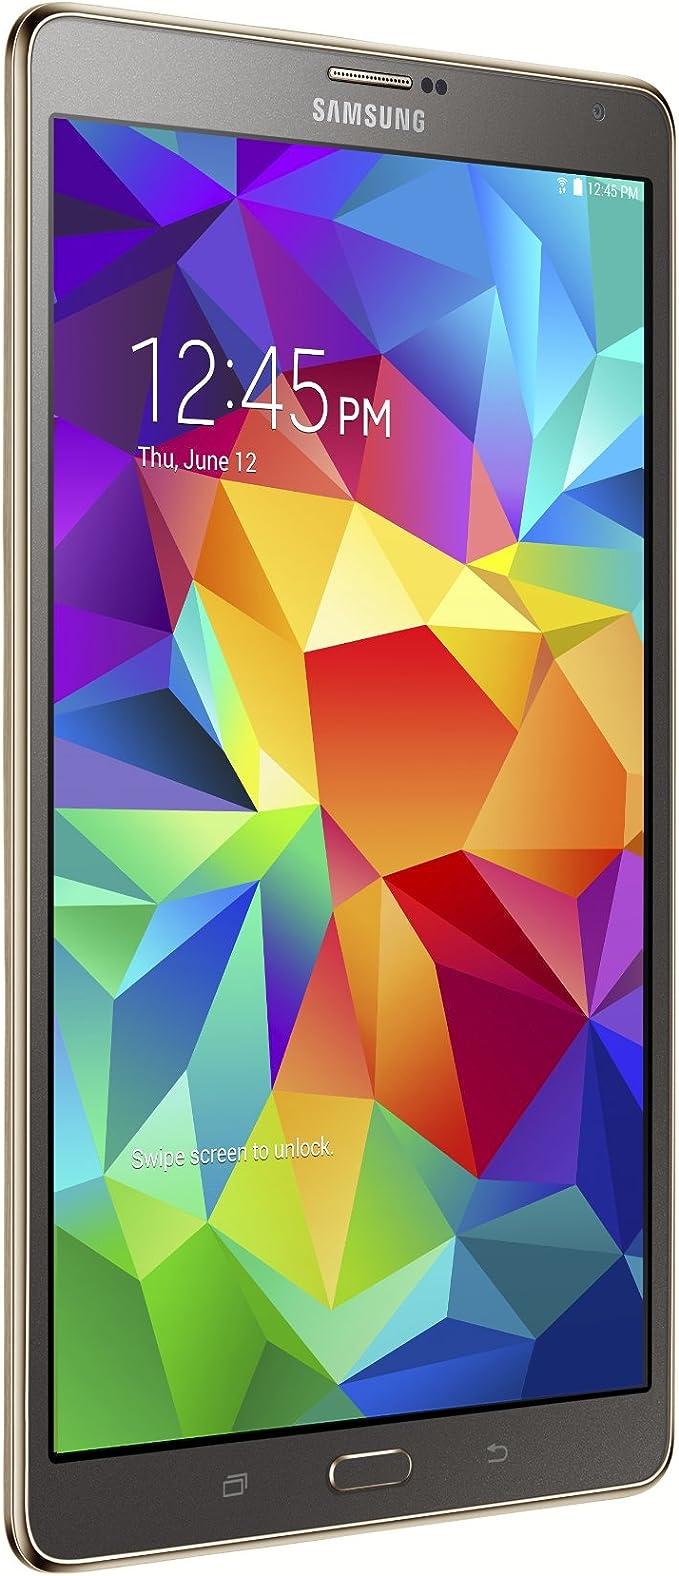 Samsung Galaxy Tab S 8.4 16GB Bronce - Tablet (Minitableta ...